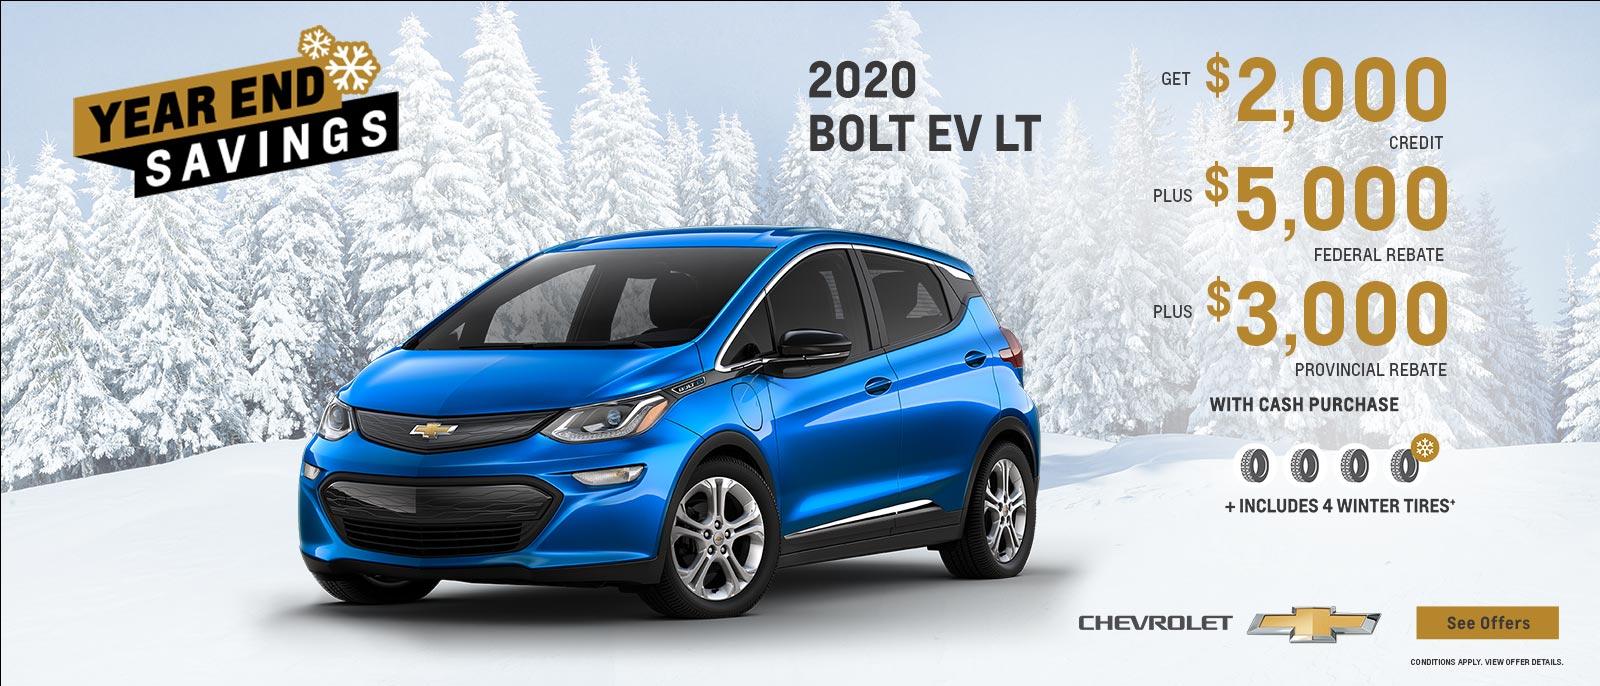 2020 Bolt EV